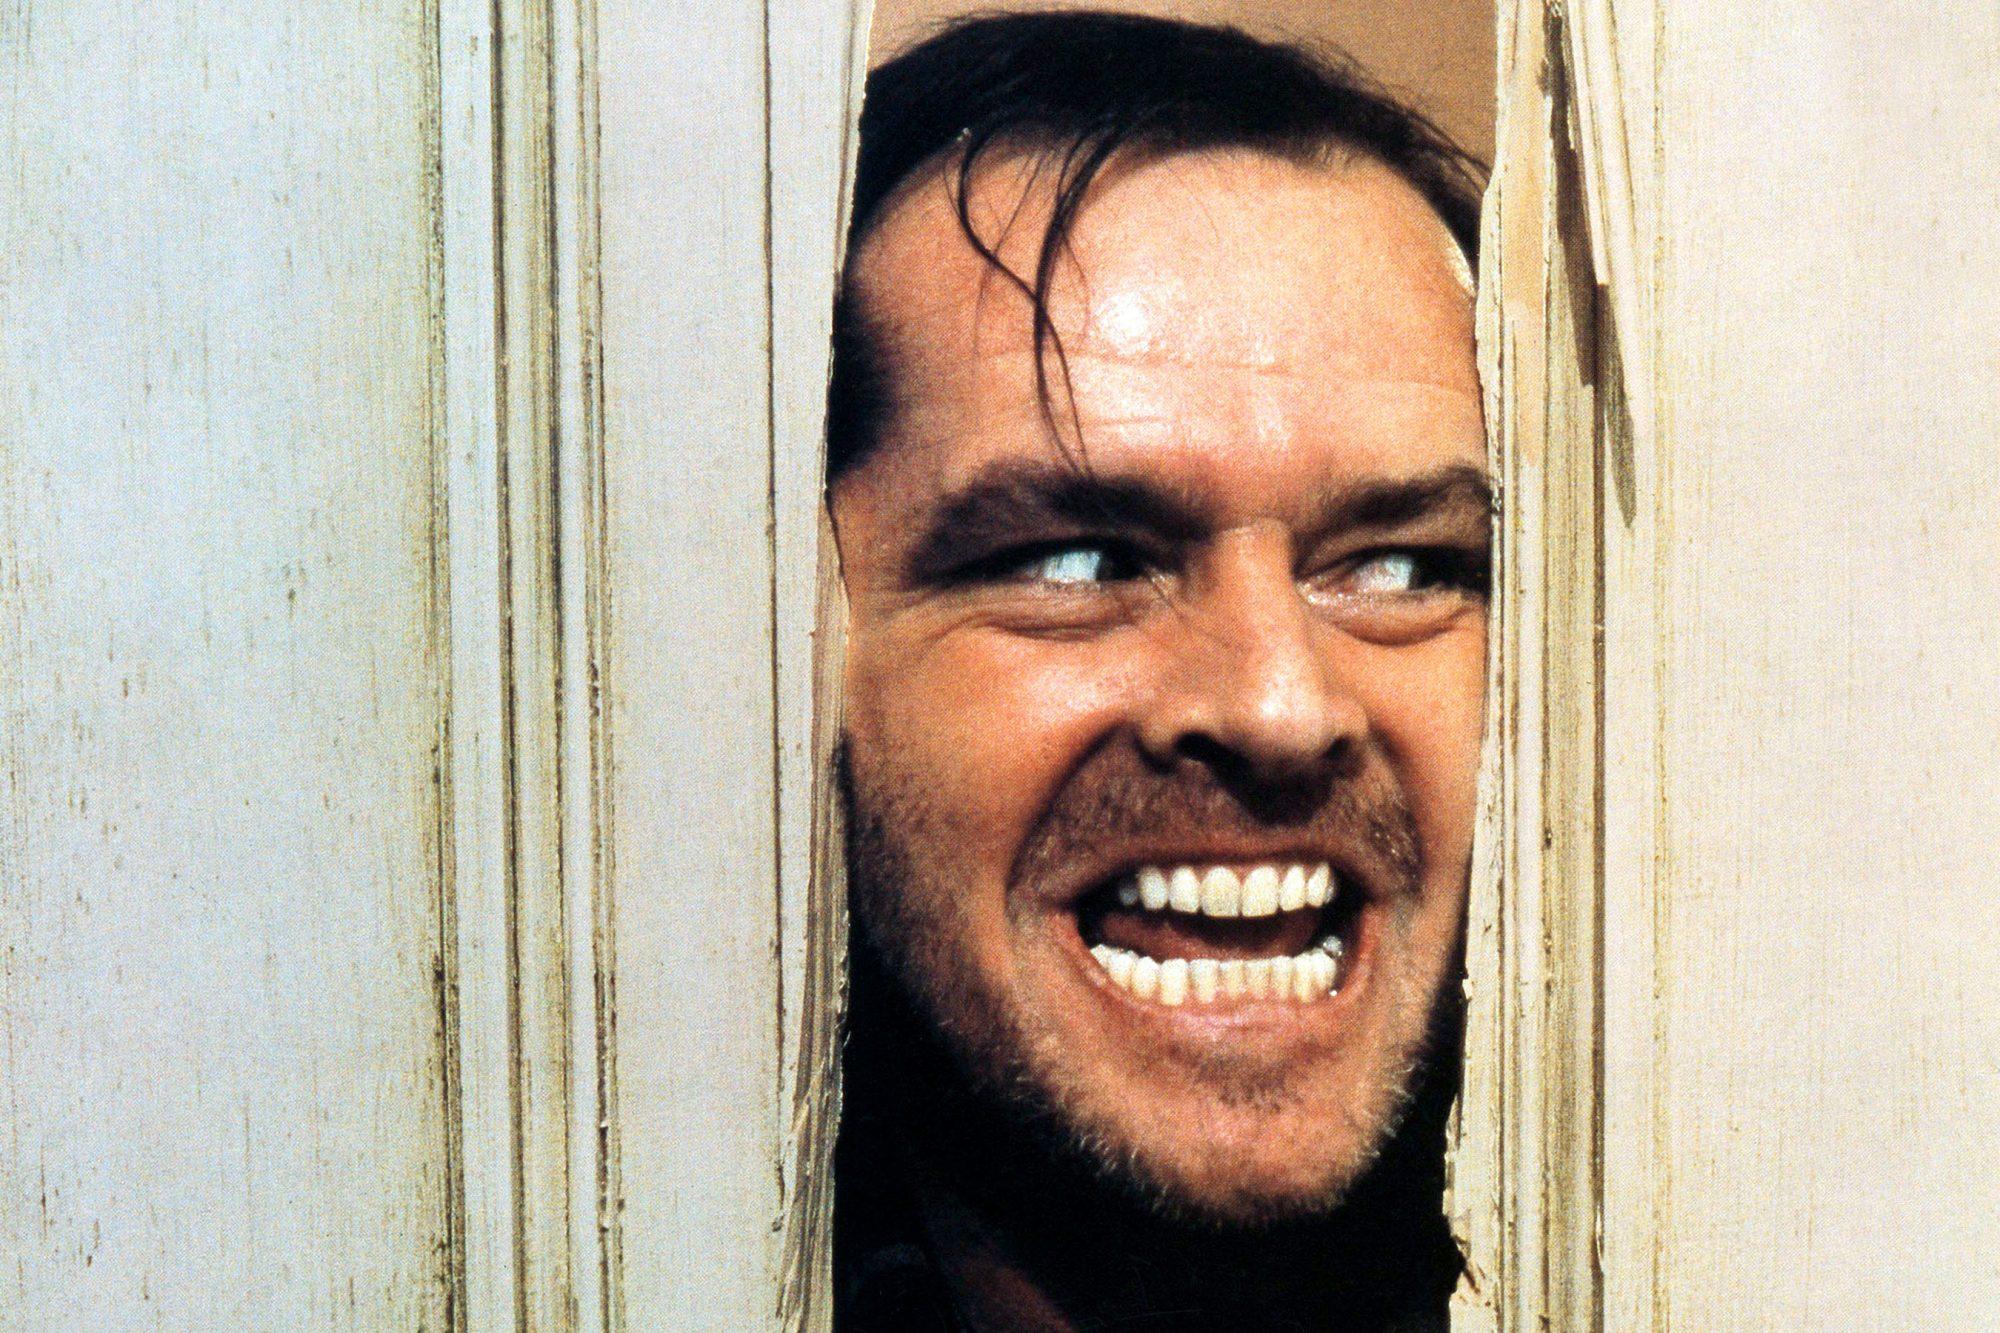 THE SHINING, Jack Nicholson, 1980. ©Warner Brothers